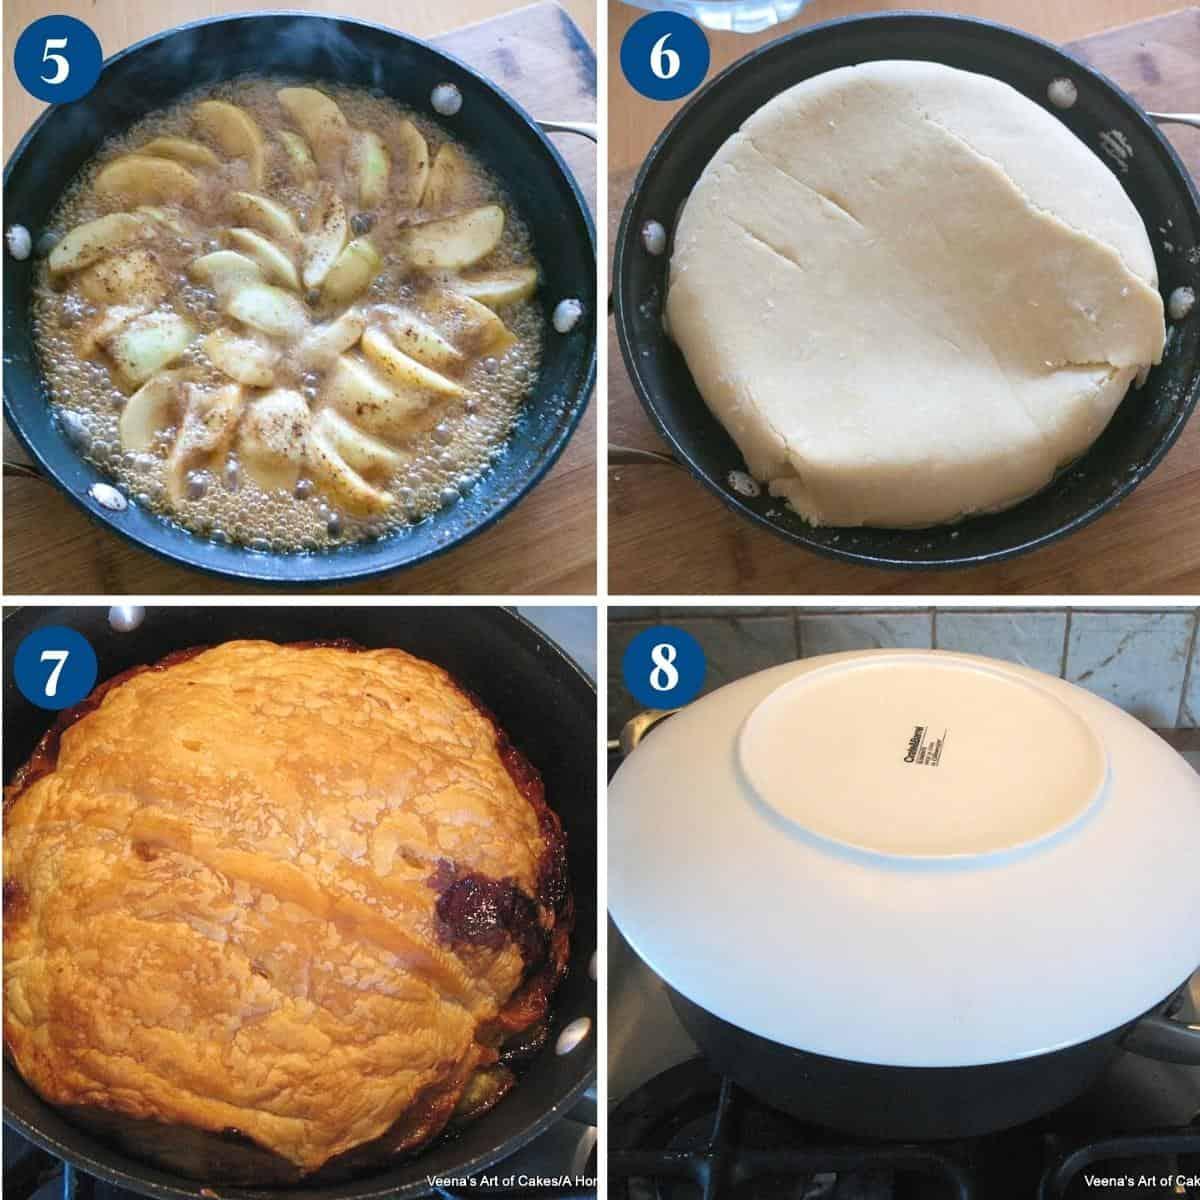 Progress pictures collage baking the tarte tatin.